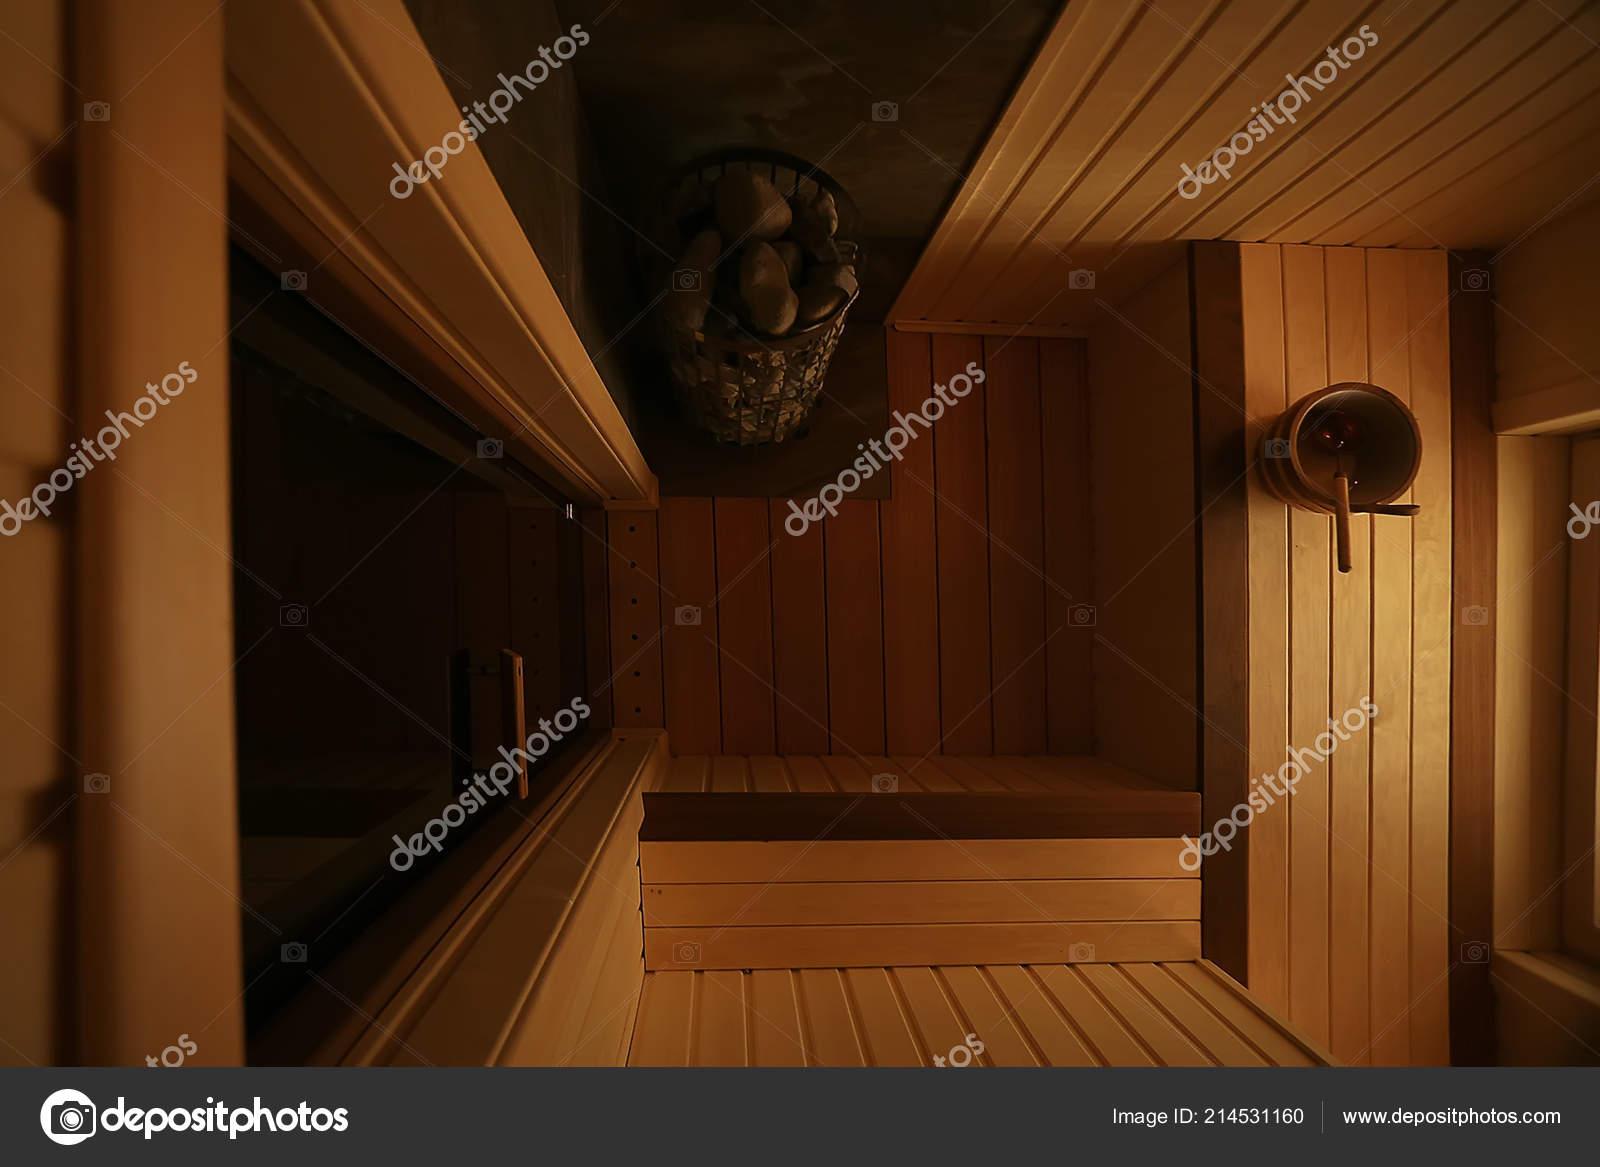 Sauna Wooden Interior Baths Wooden Benches Loungers Accessories